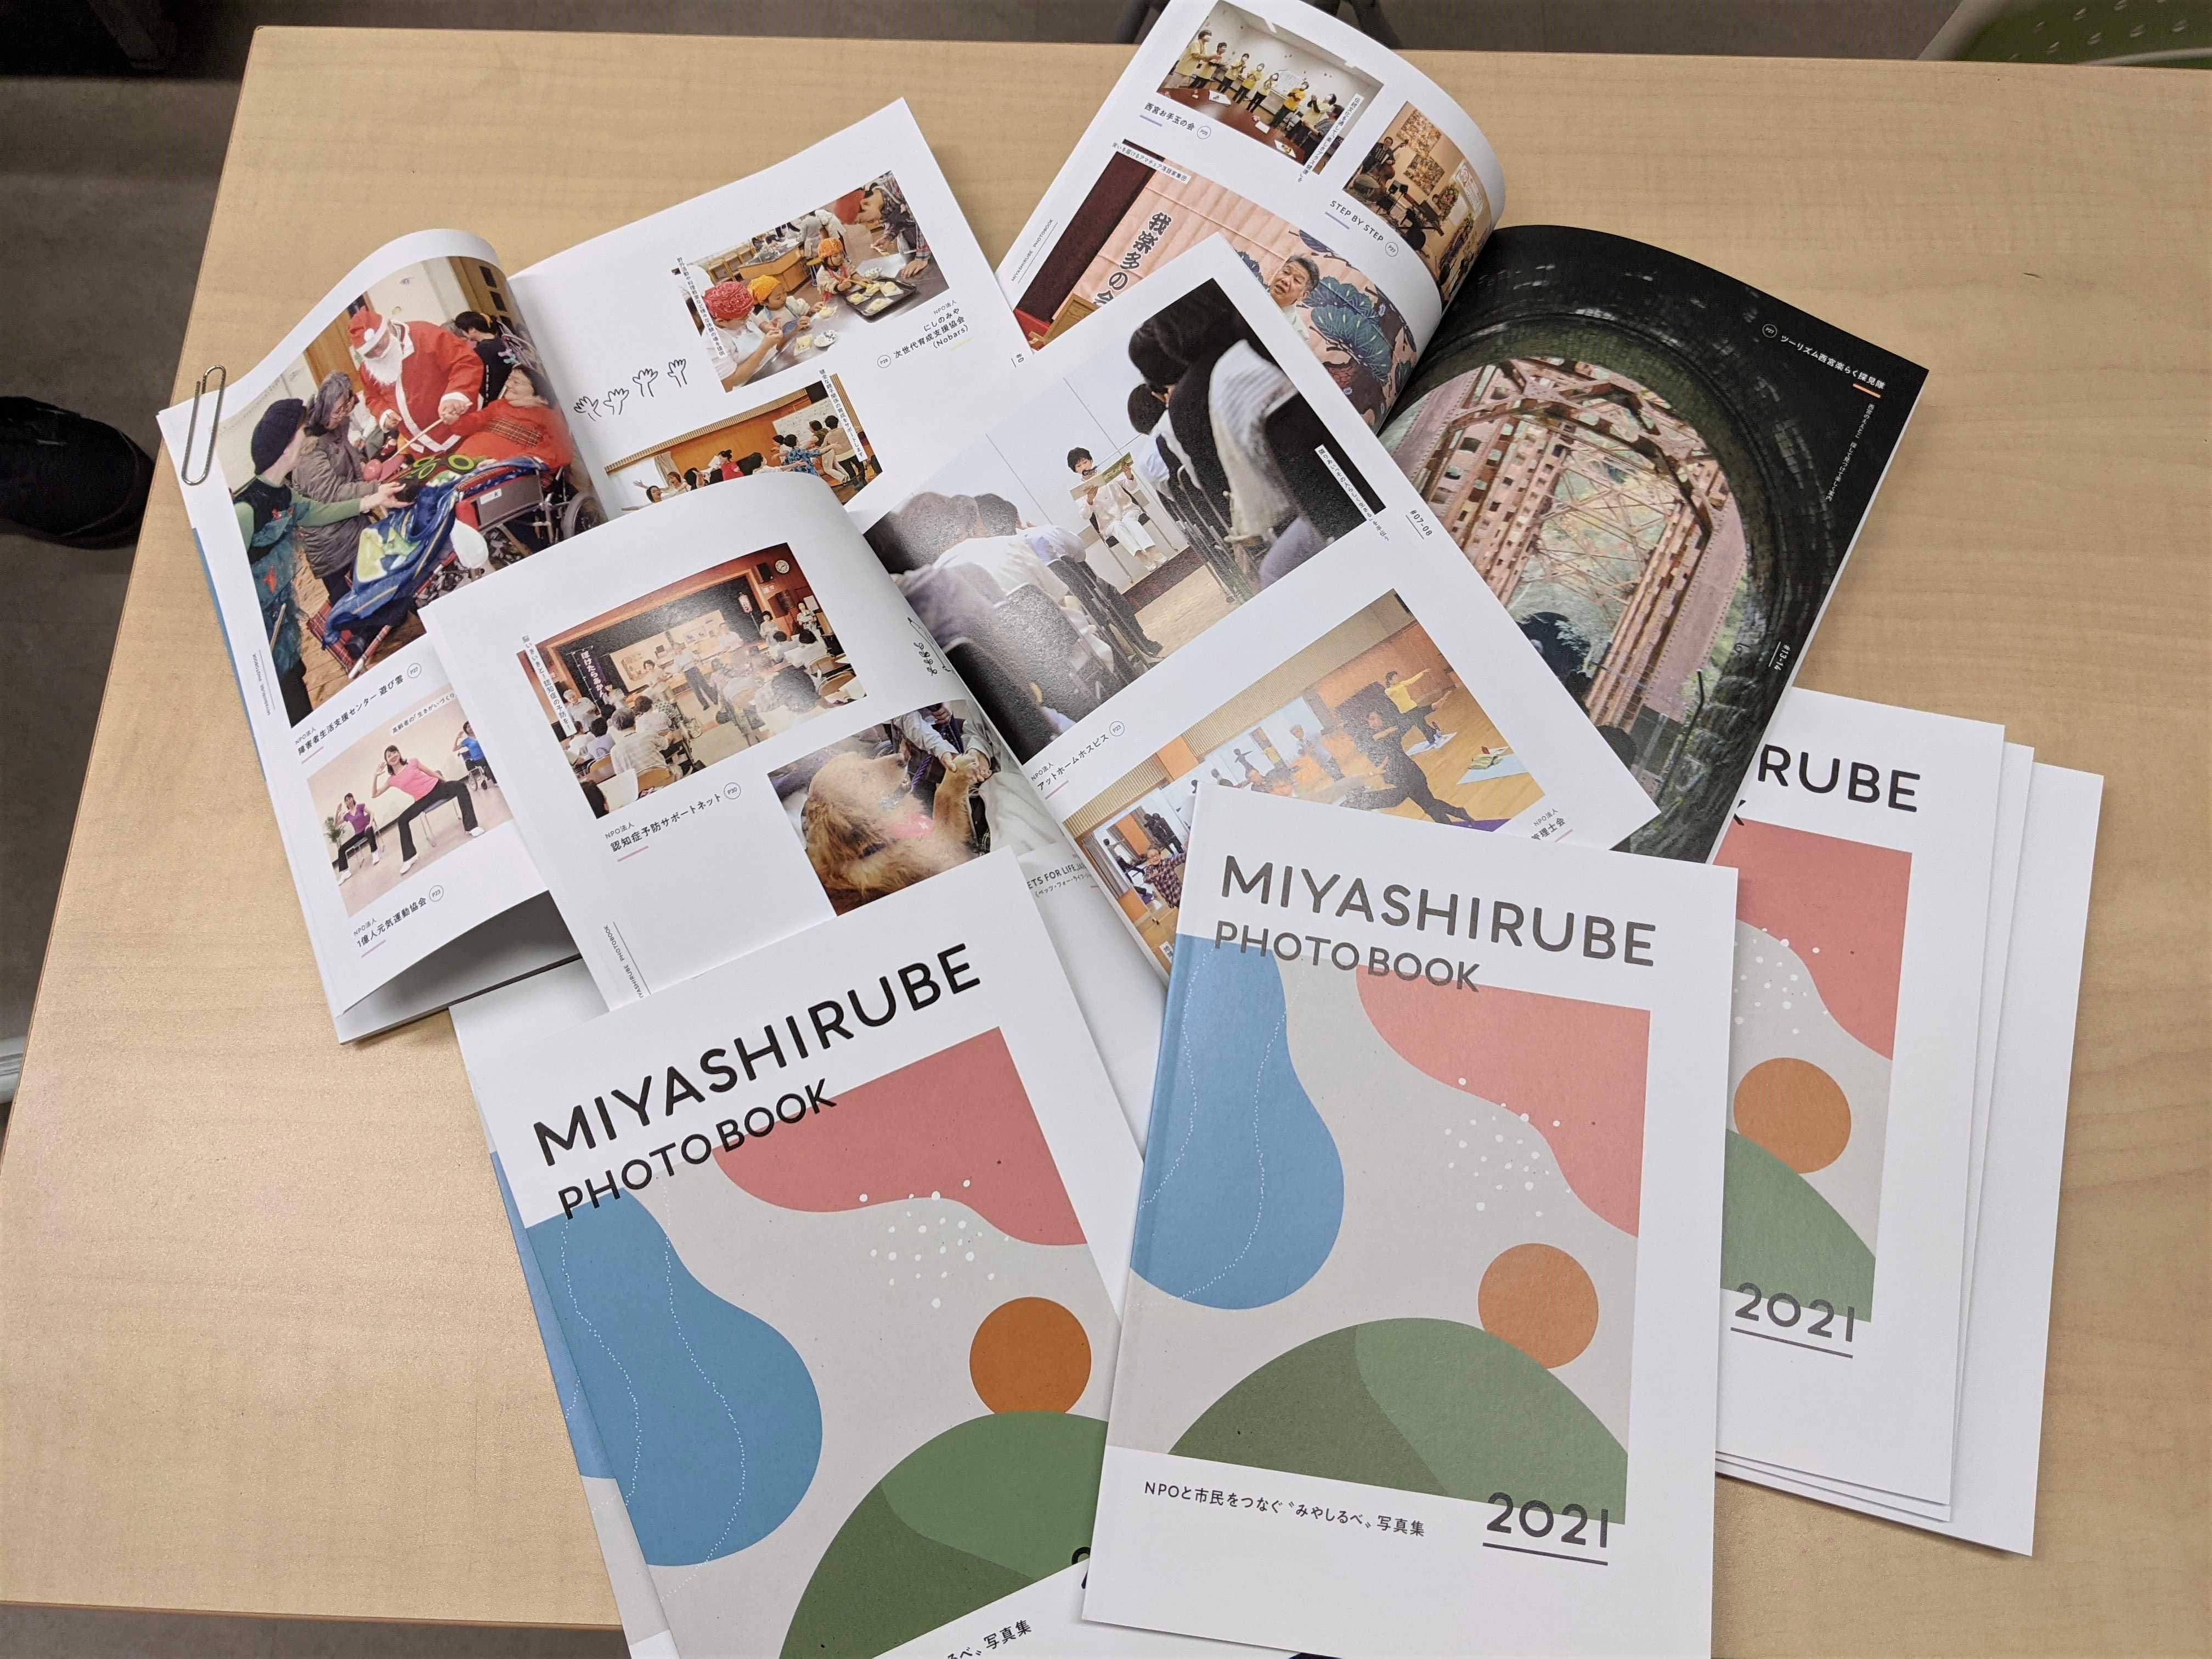 miyashirube2021-1